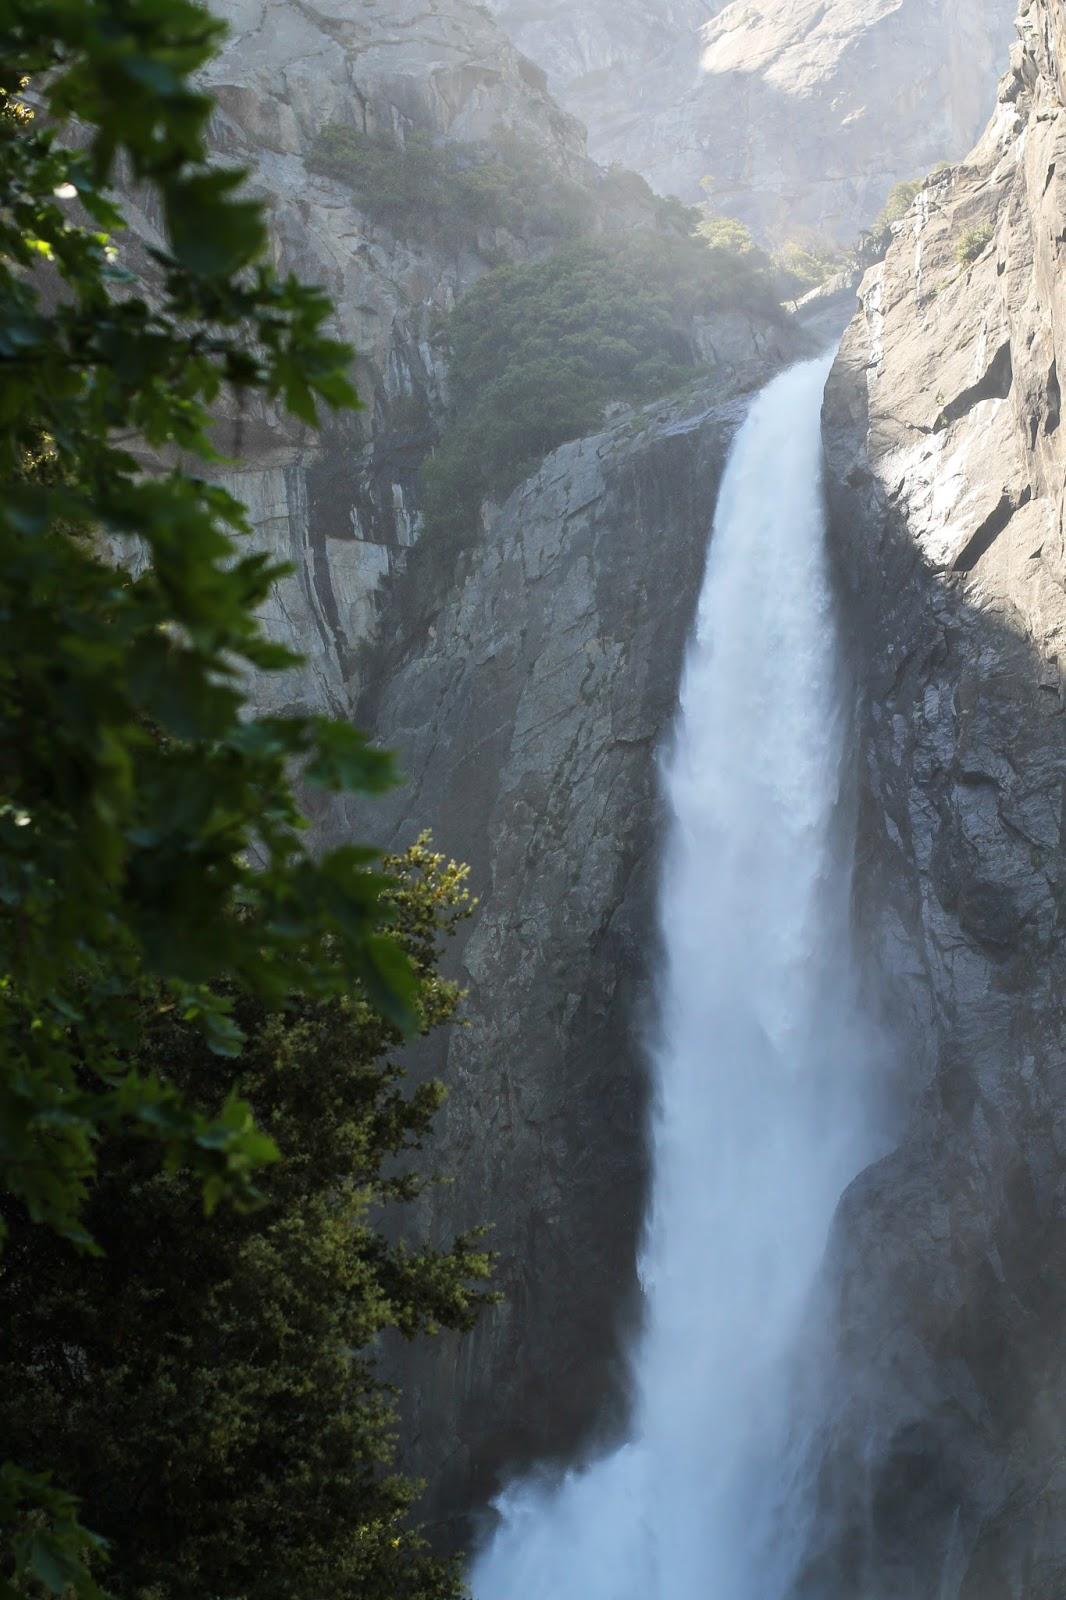 Yosemite Vernal Falls Yosemite Falls Camping Shirts